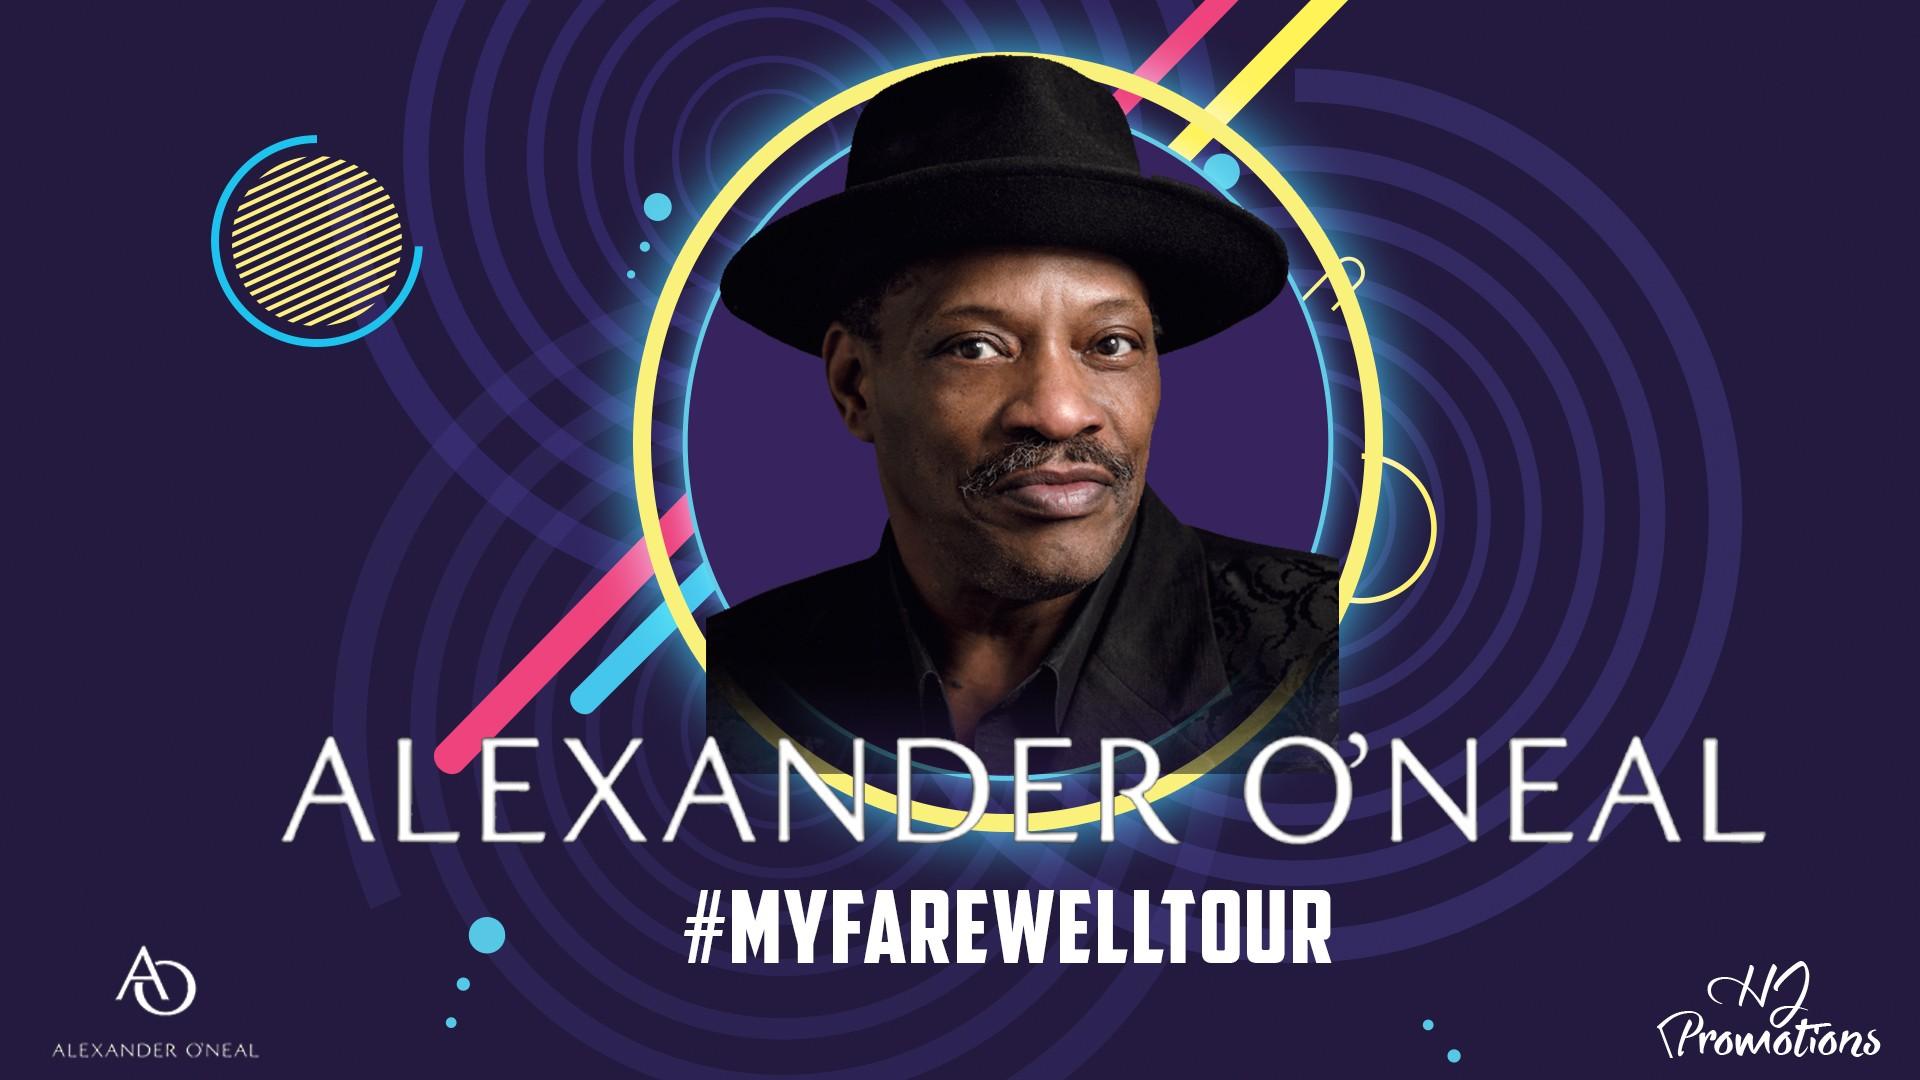 Alexander O'Neal #MyFarewellTour